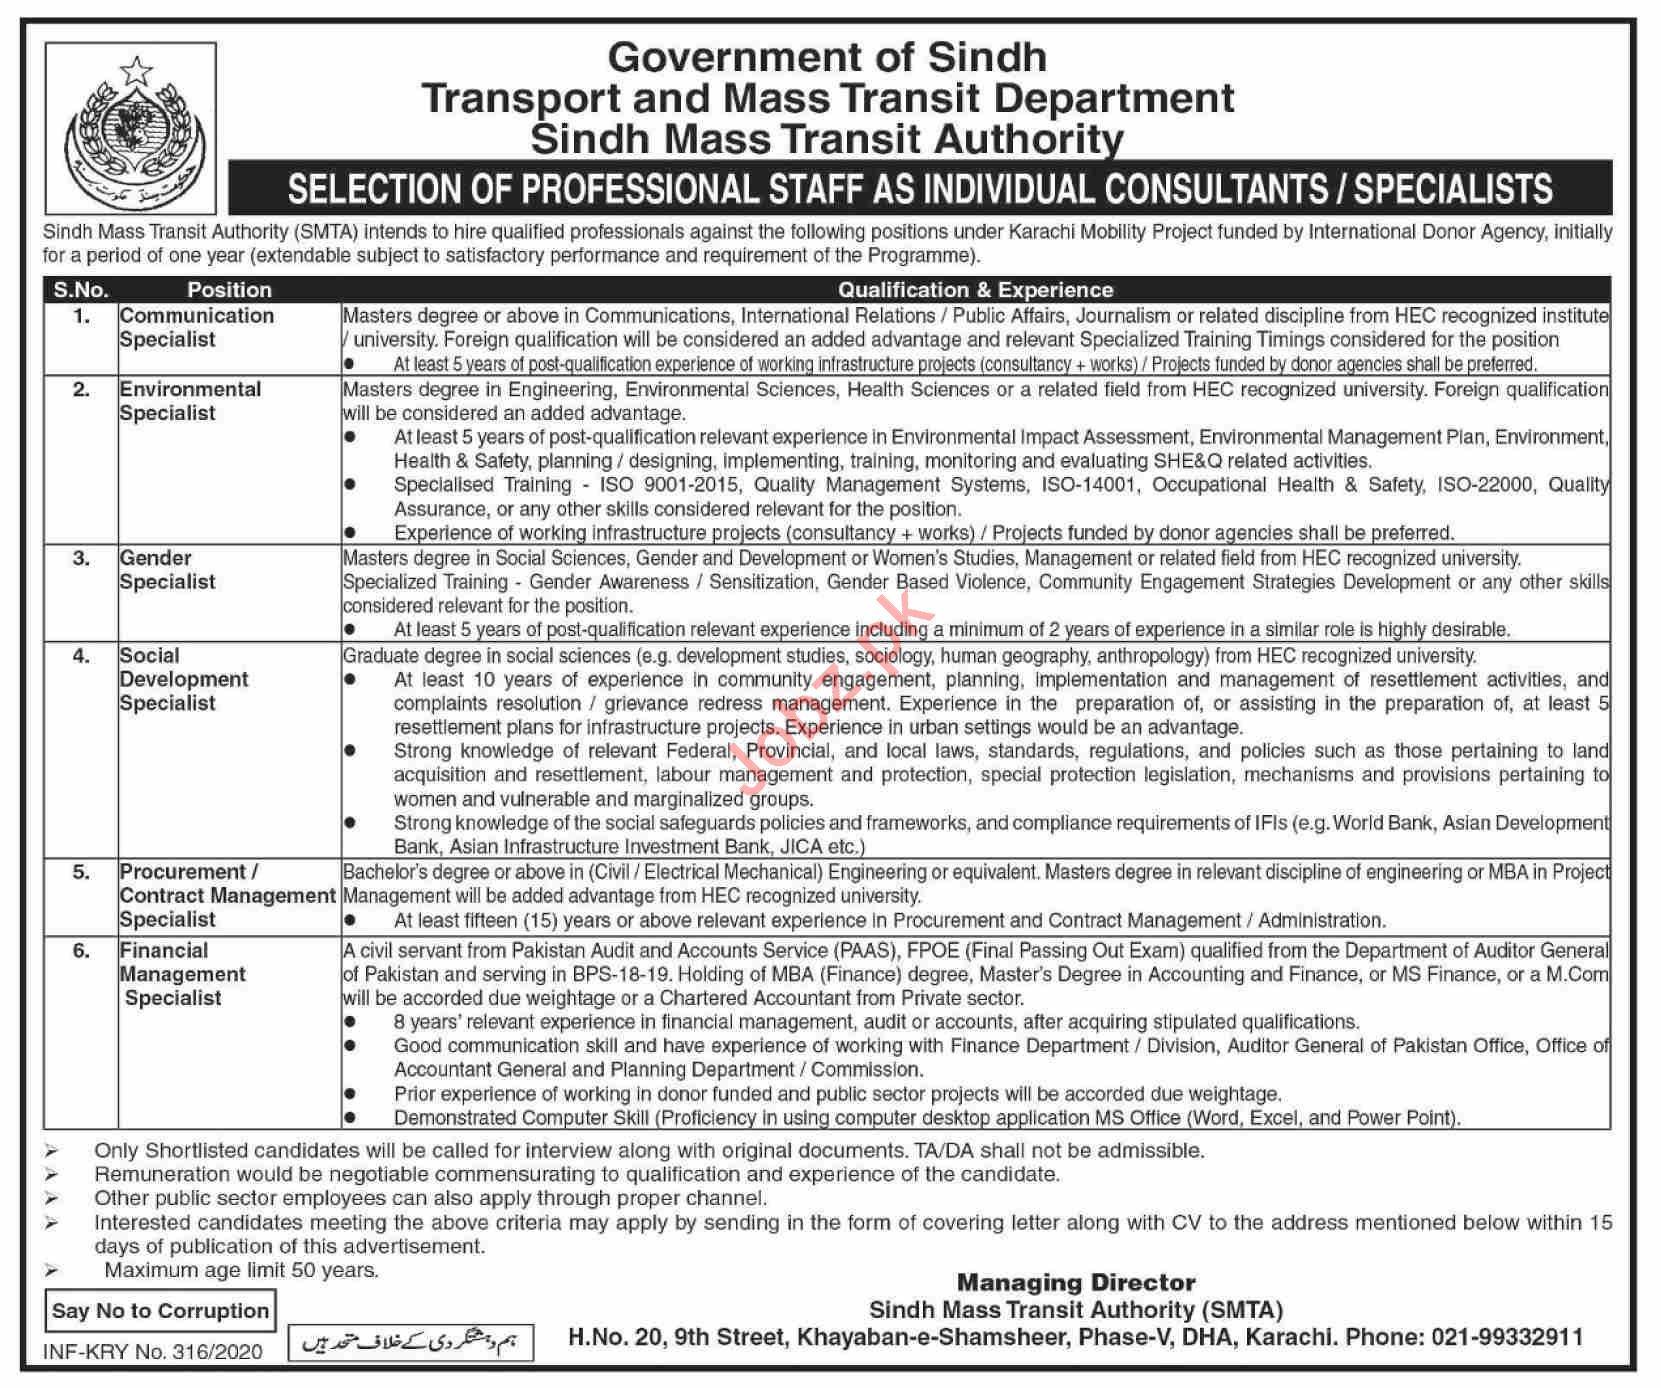 Sindh Transport & Mass Transit Department Jobs 2020